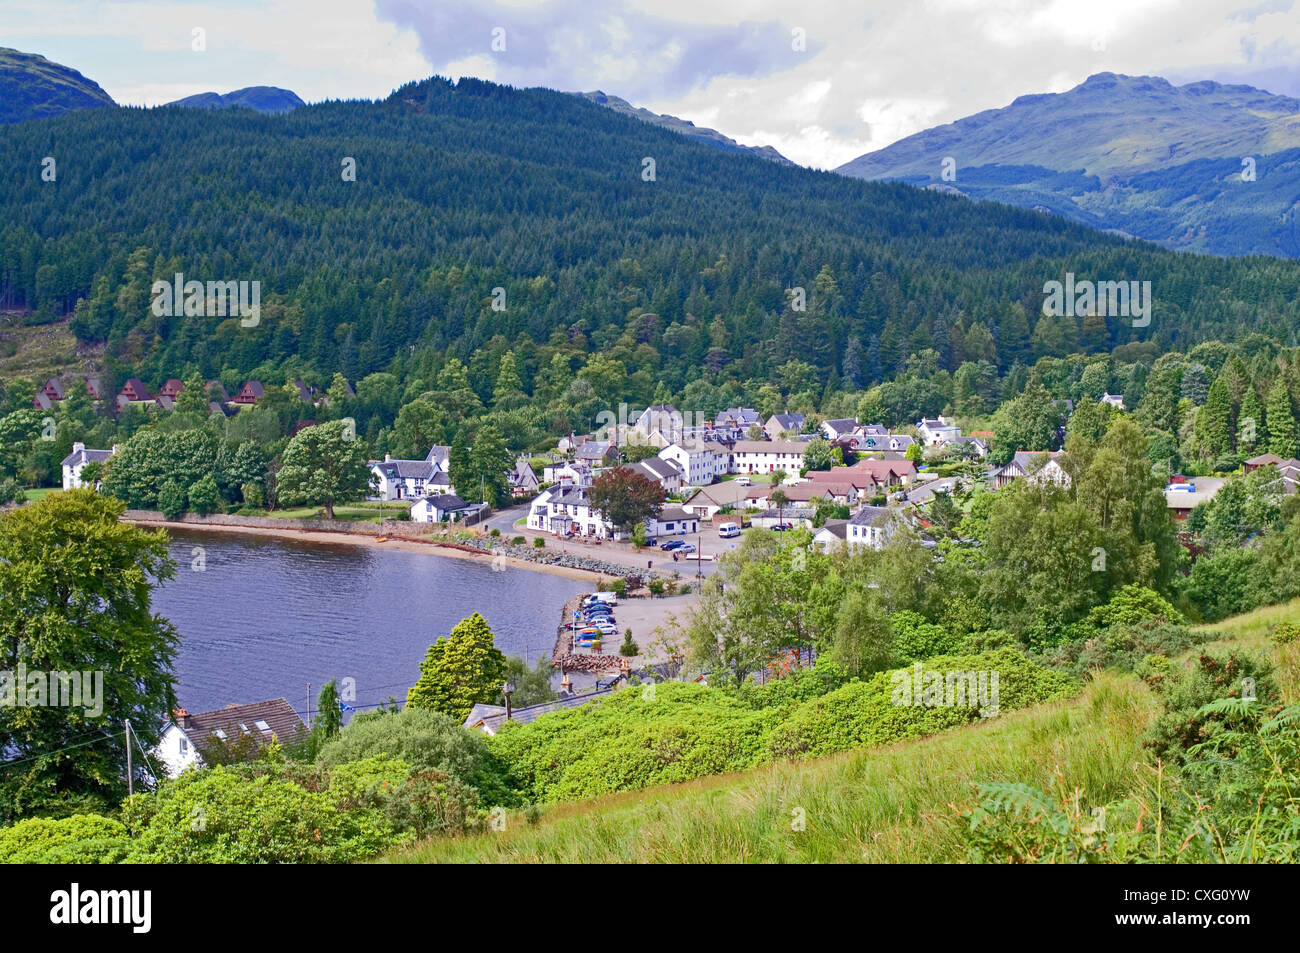 Looking down on village of Lochgoilhead, Loch Goil, Drimsynie holiday lodges on left, Ardgoil, Argyll Forest Park, - Stock Image